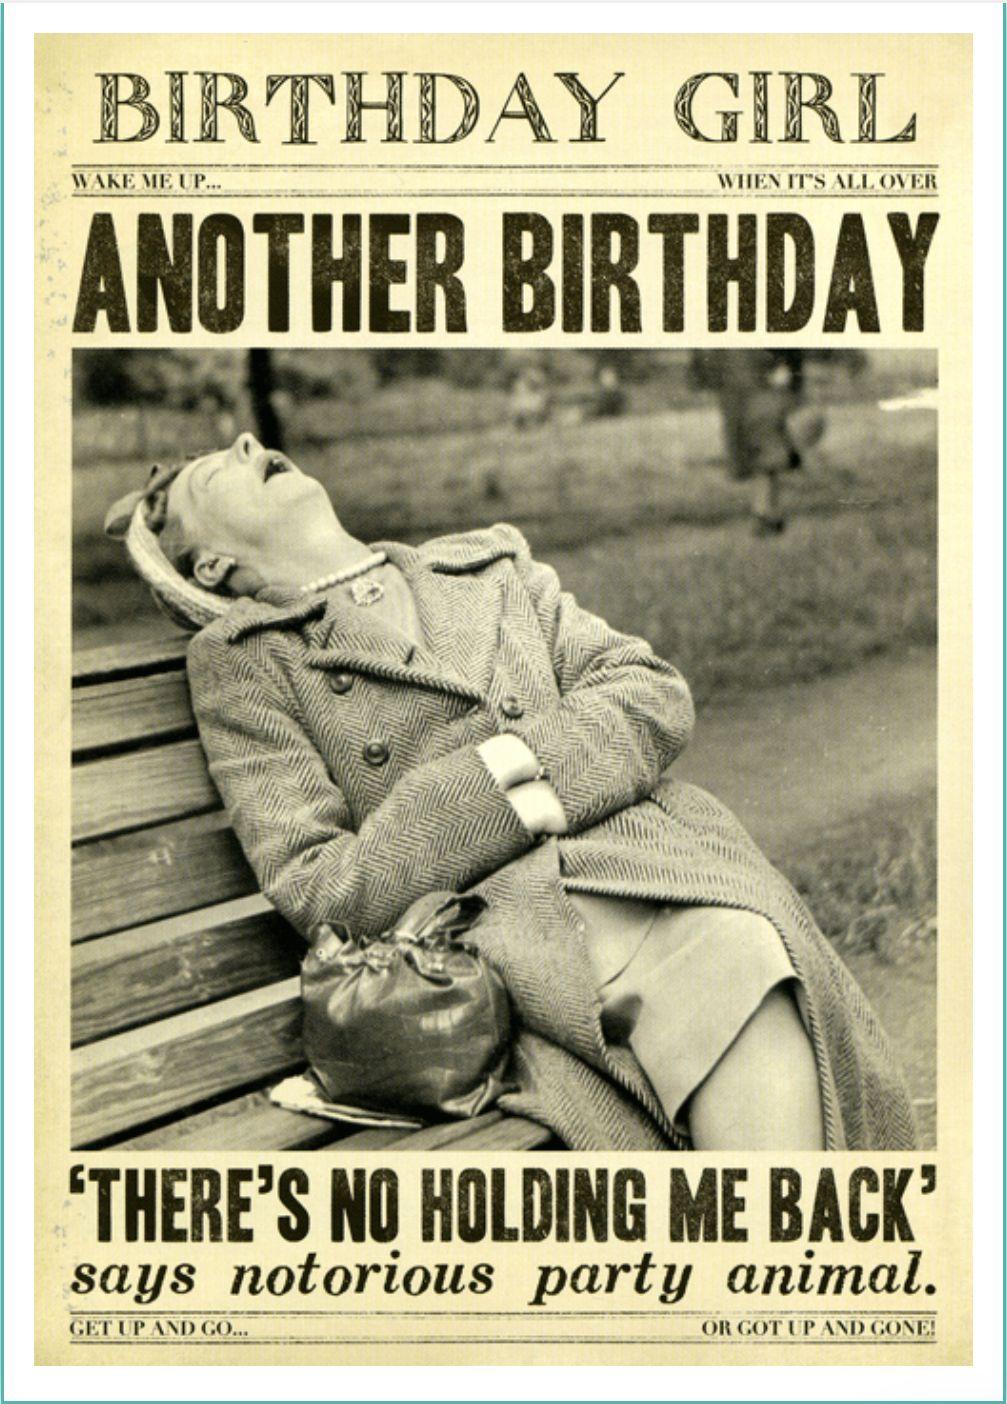 Happy Birthday Funny Girl Images : happy, birthday, funny, images, Humour, Verjaardag, Citaten, Grappig,, Verjaardagswensen, Verjaardagscitaten